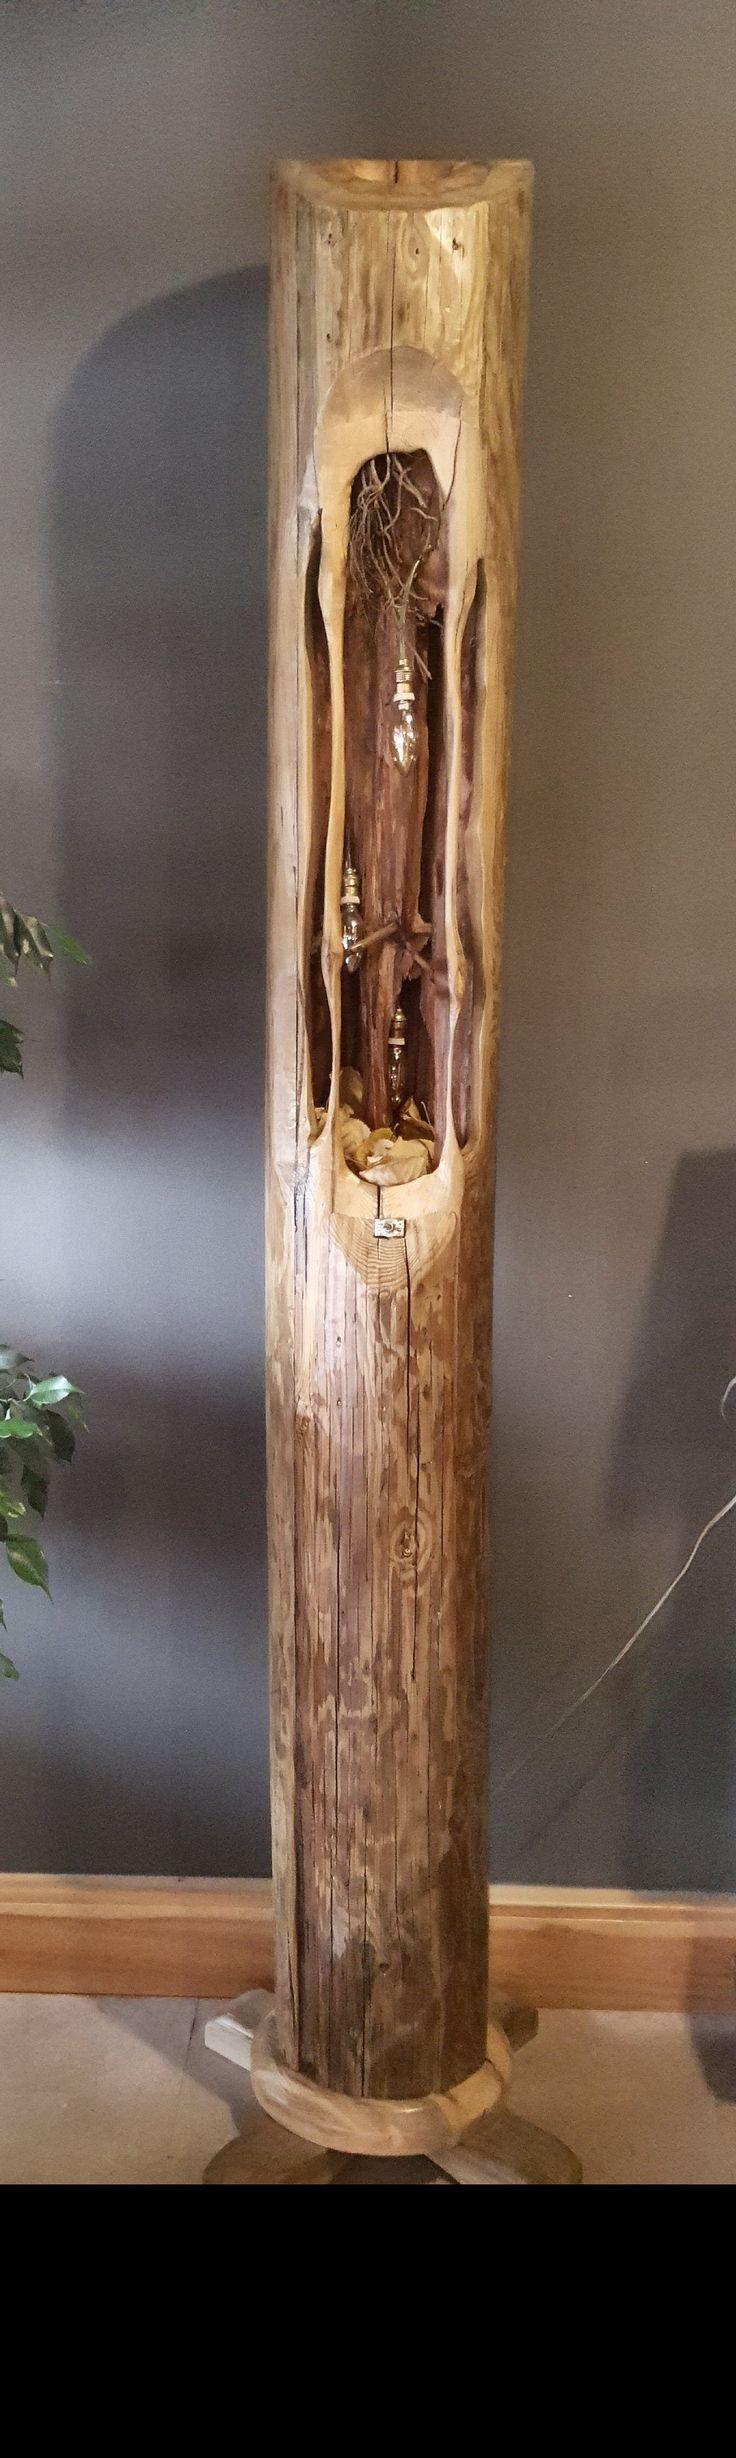 Holzleuchte, Holzdesign, Holz Handwerk, Blitze, Kunstprojekte, Telefone,  Lampen